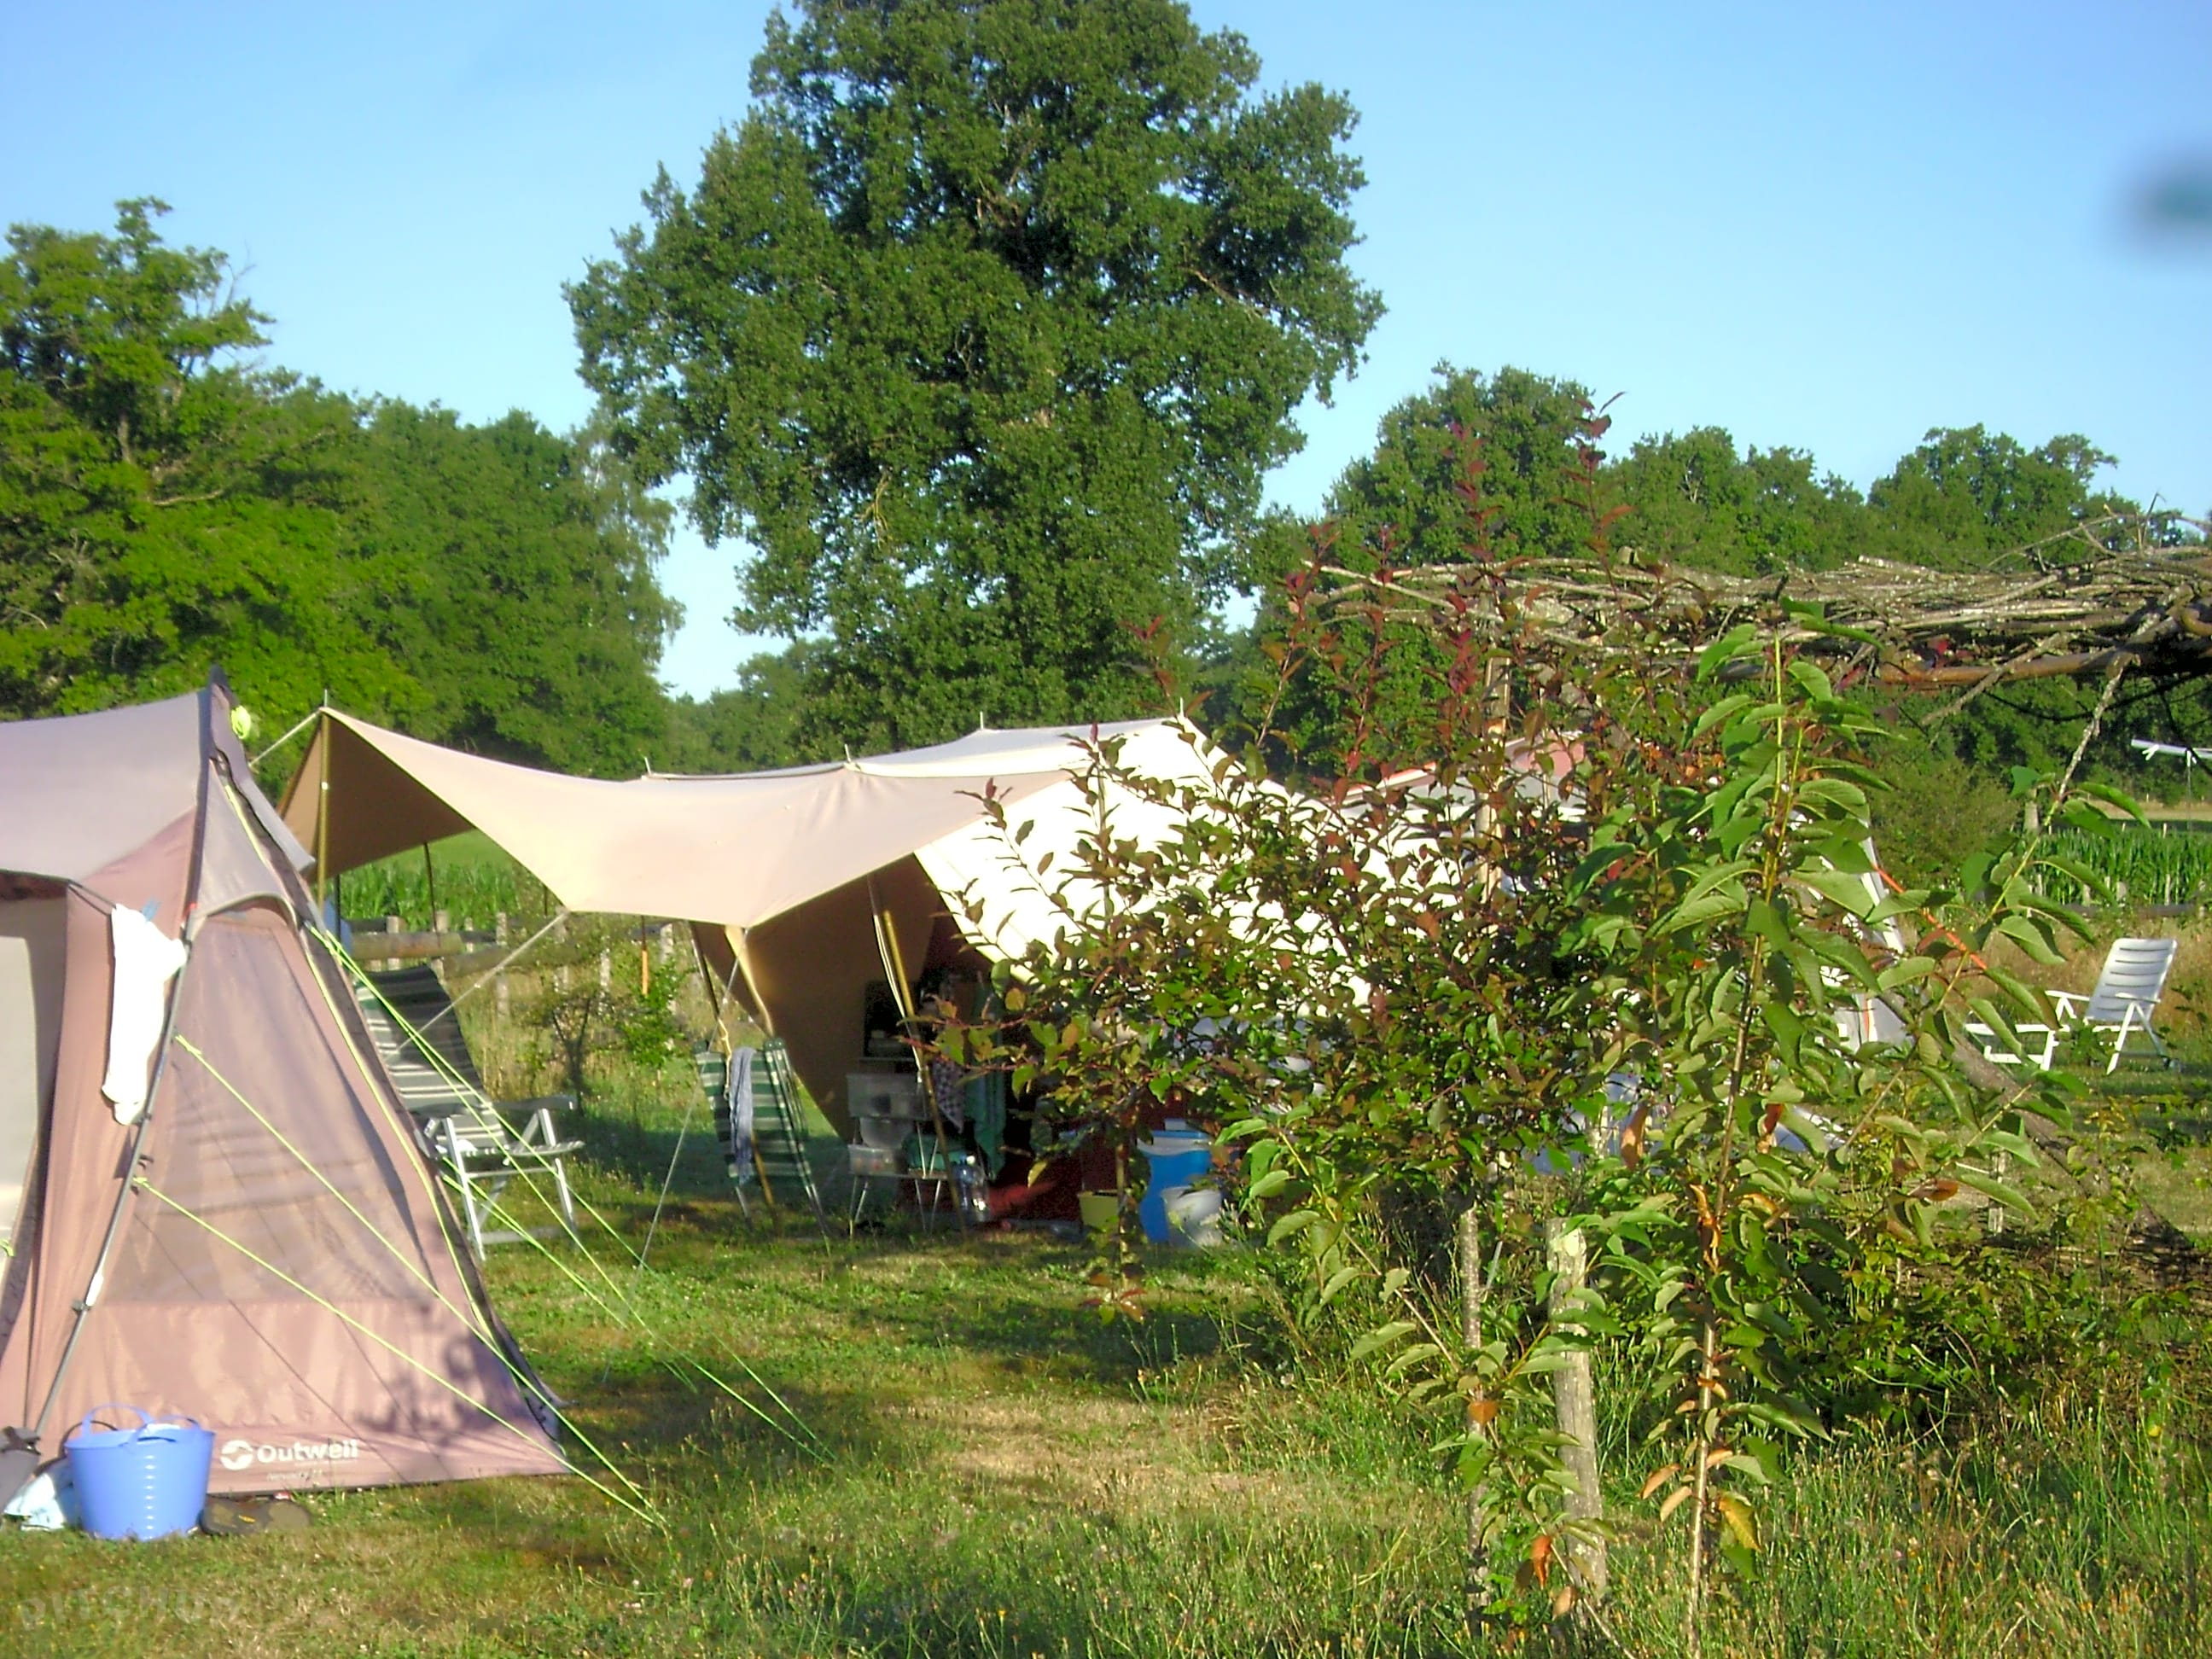 Campings de raccordement complet dans l'ouest du Michigan